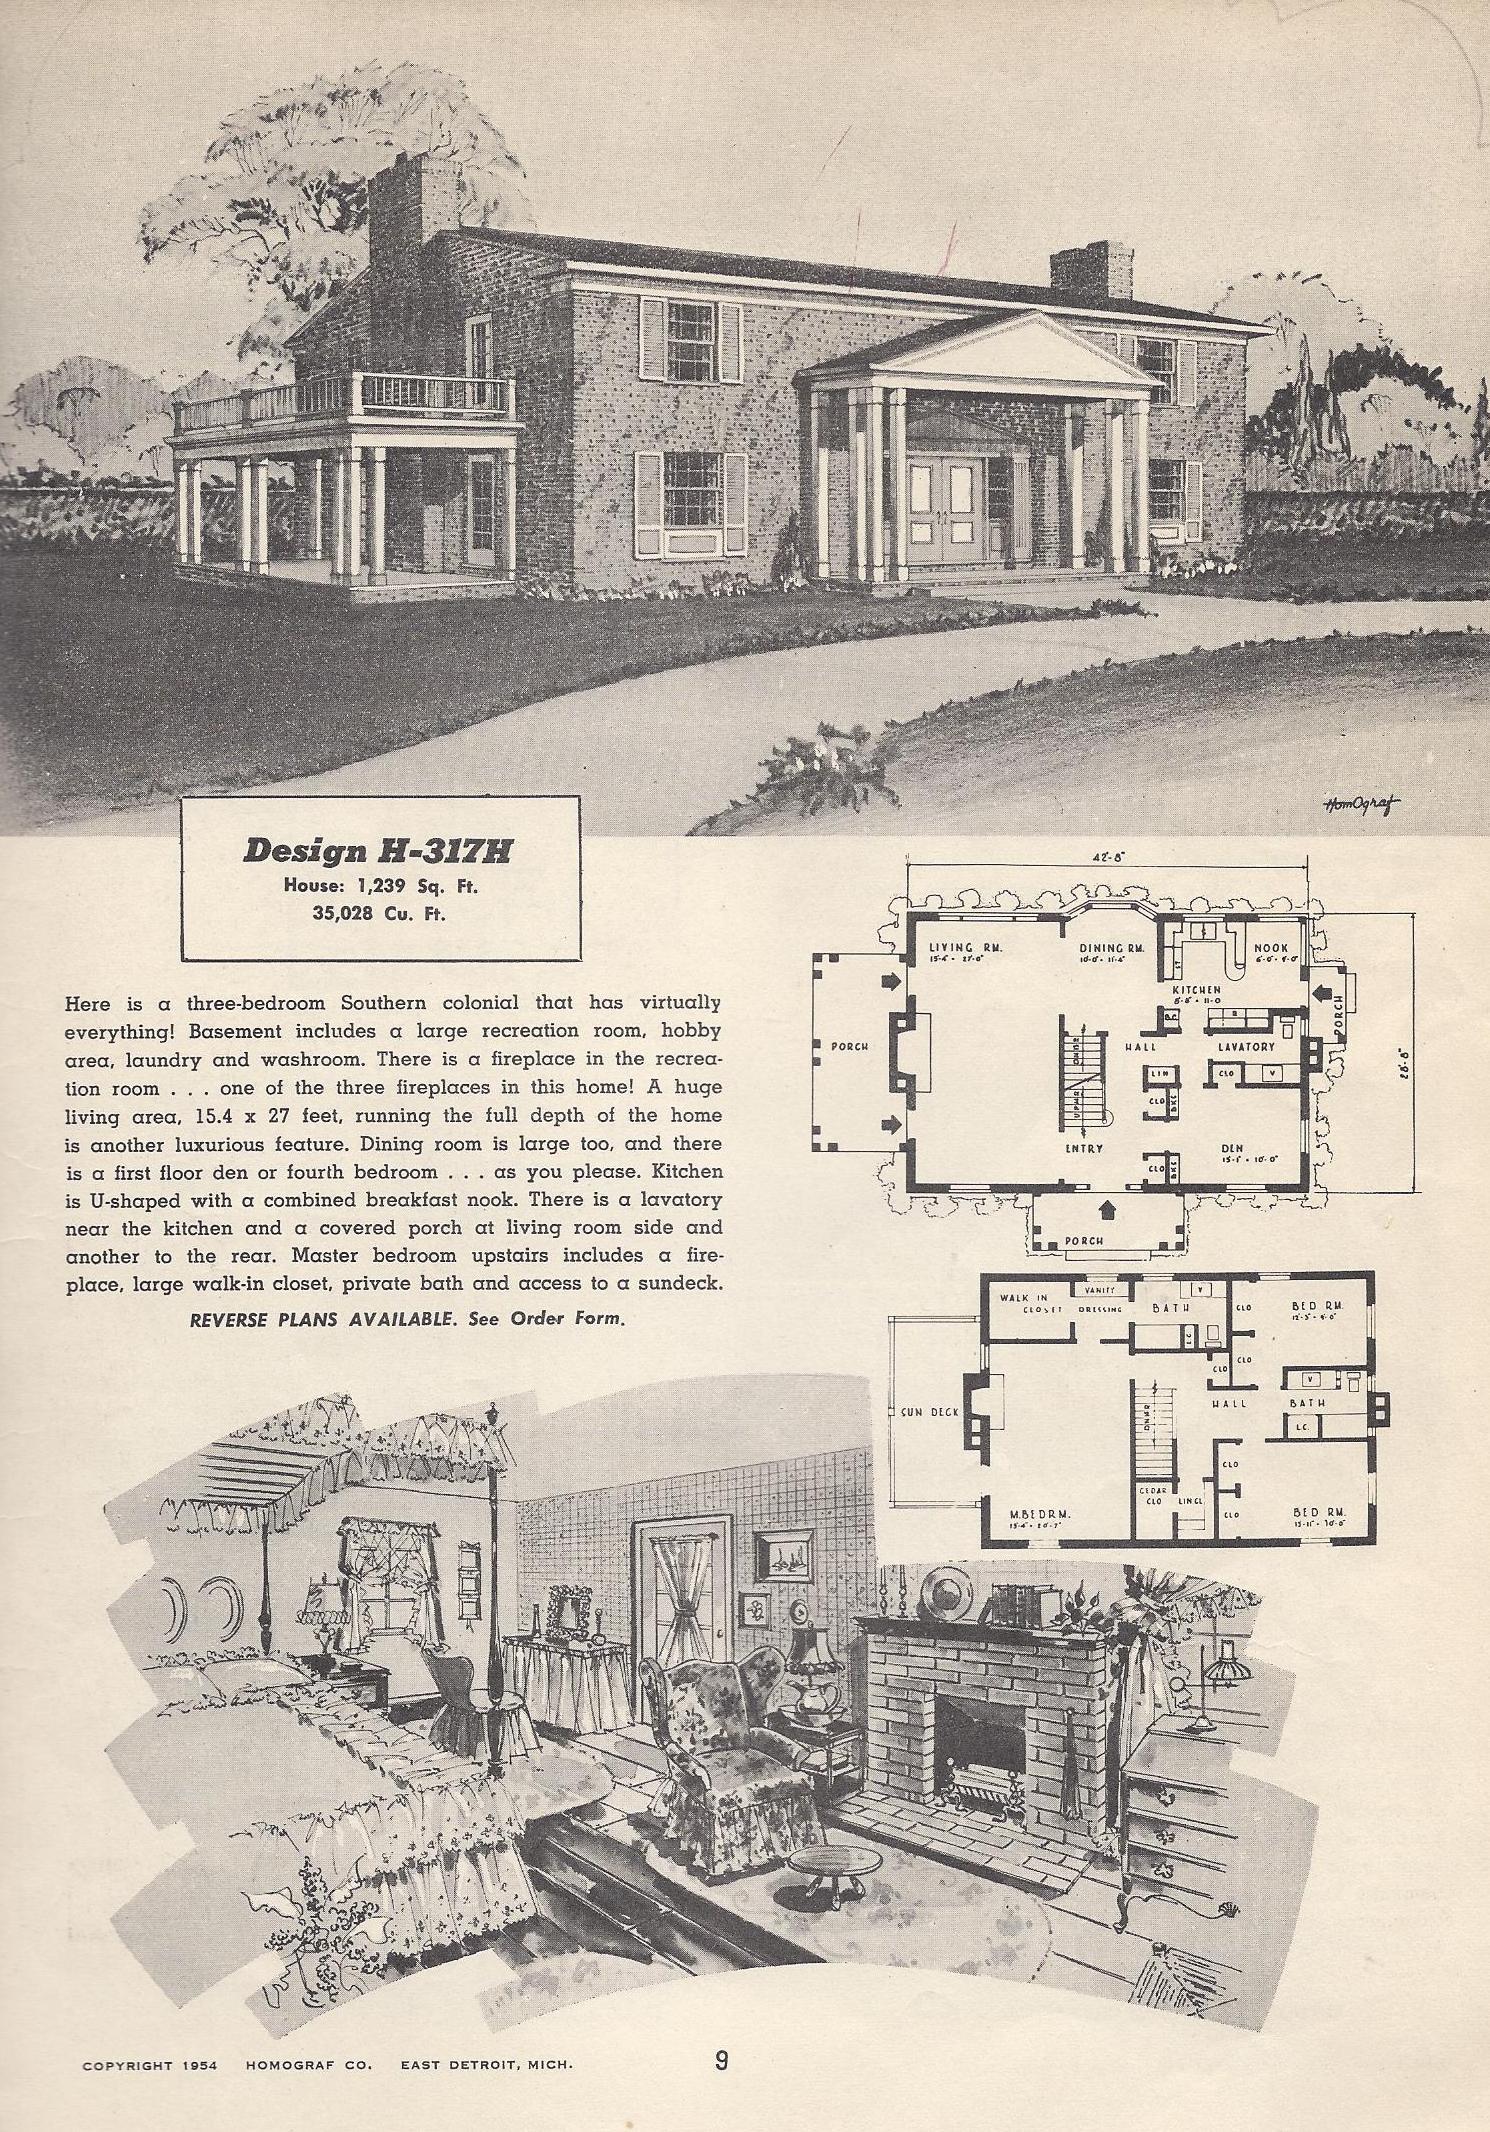 Vintage House Plans 317h